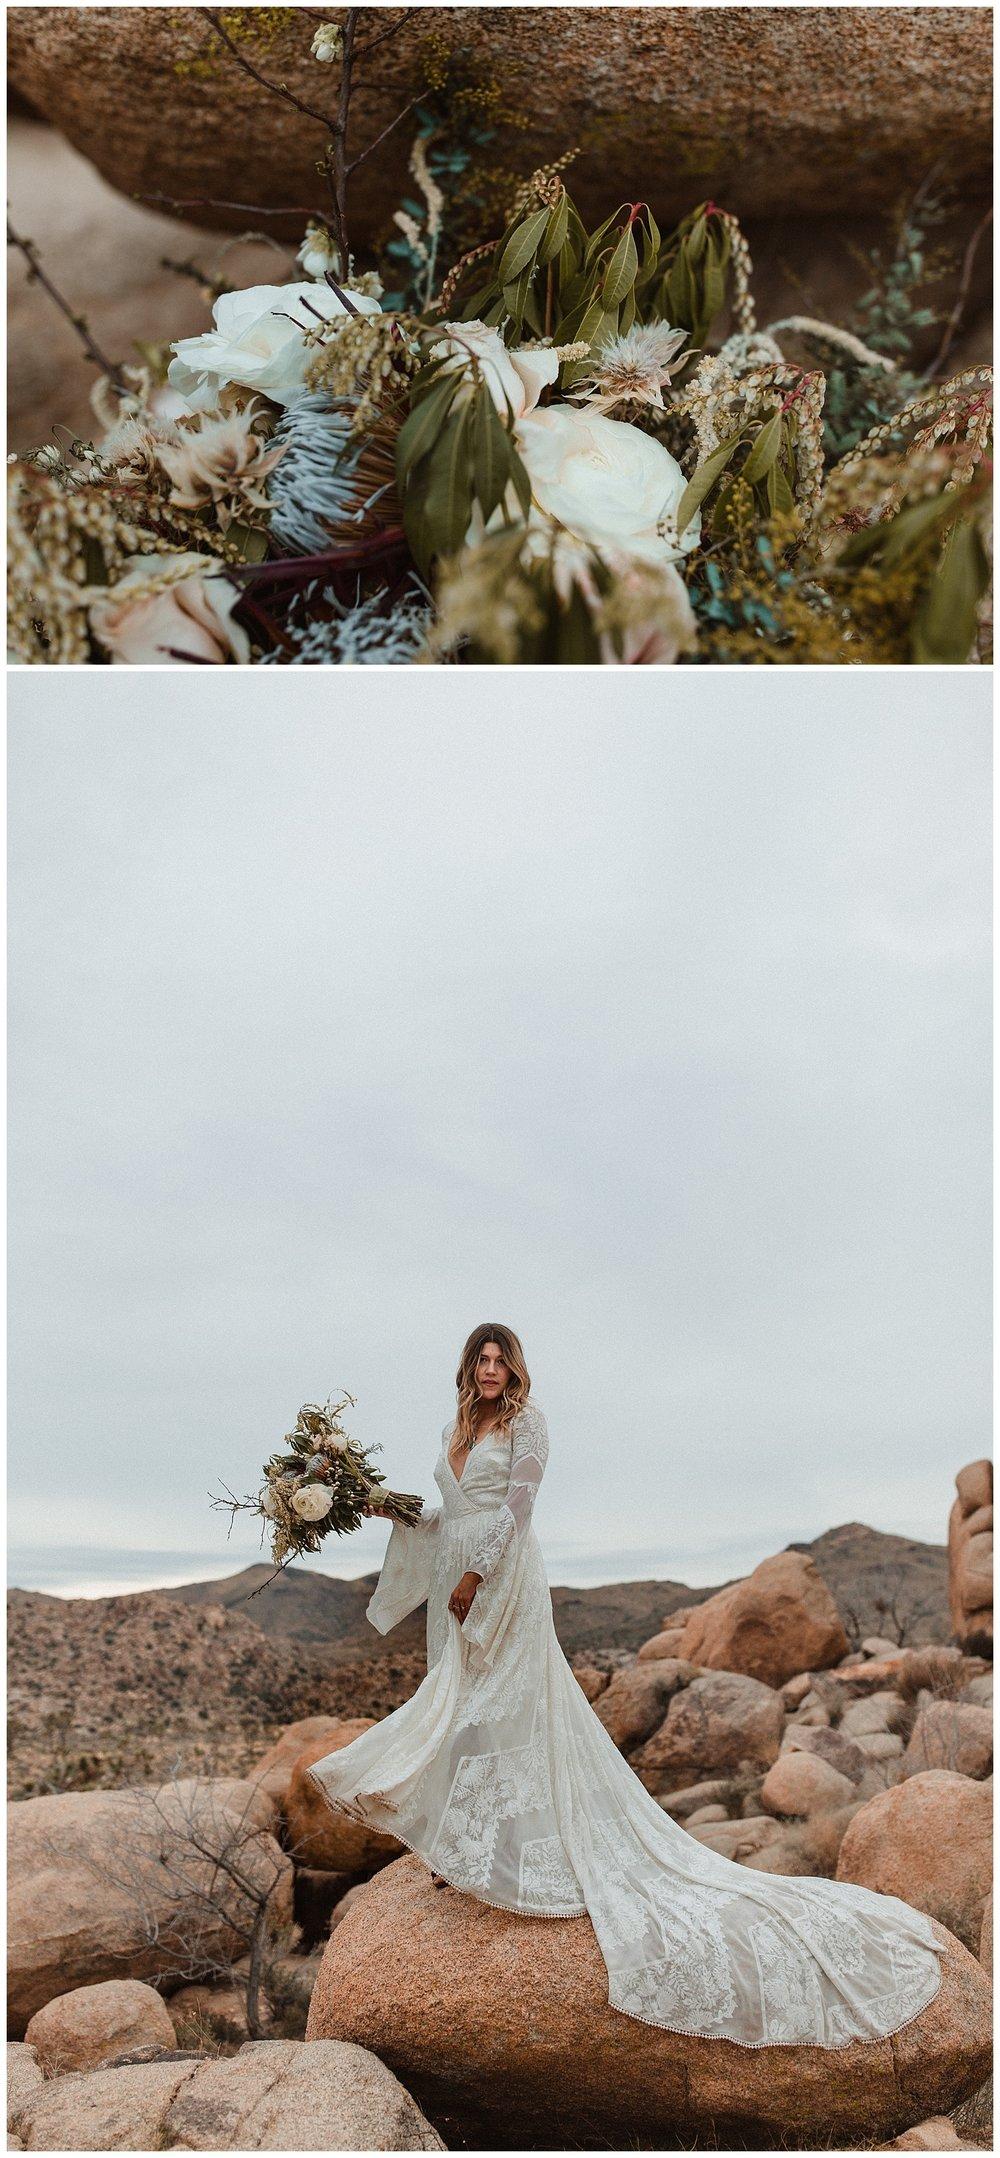 romantic_elopement_joshua_tree_adventurous_wedding_photographer_romantic_intimate_wedding_0007.jpg